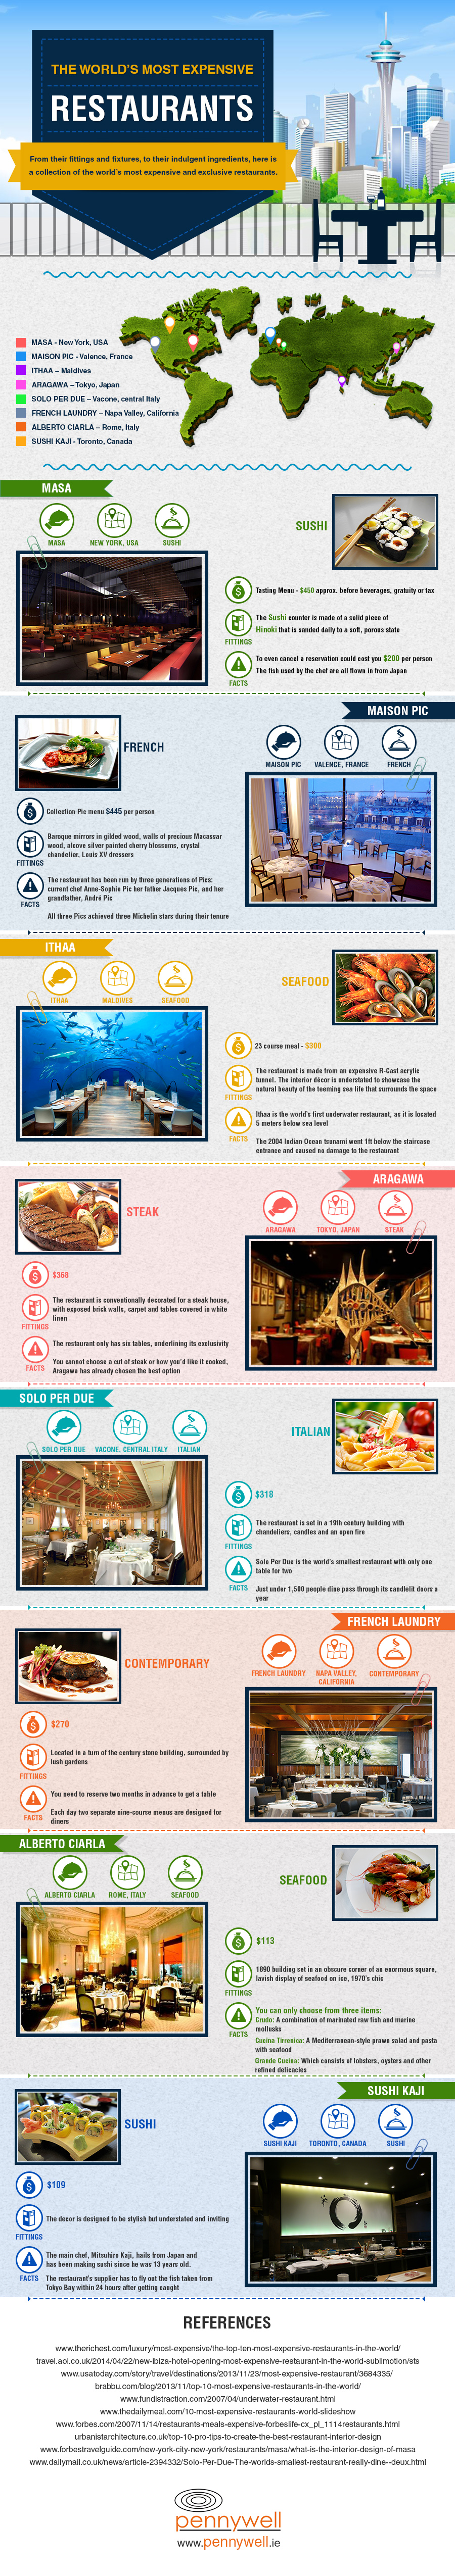 The World's Most Extravagant Restaurants - Infographic